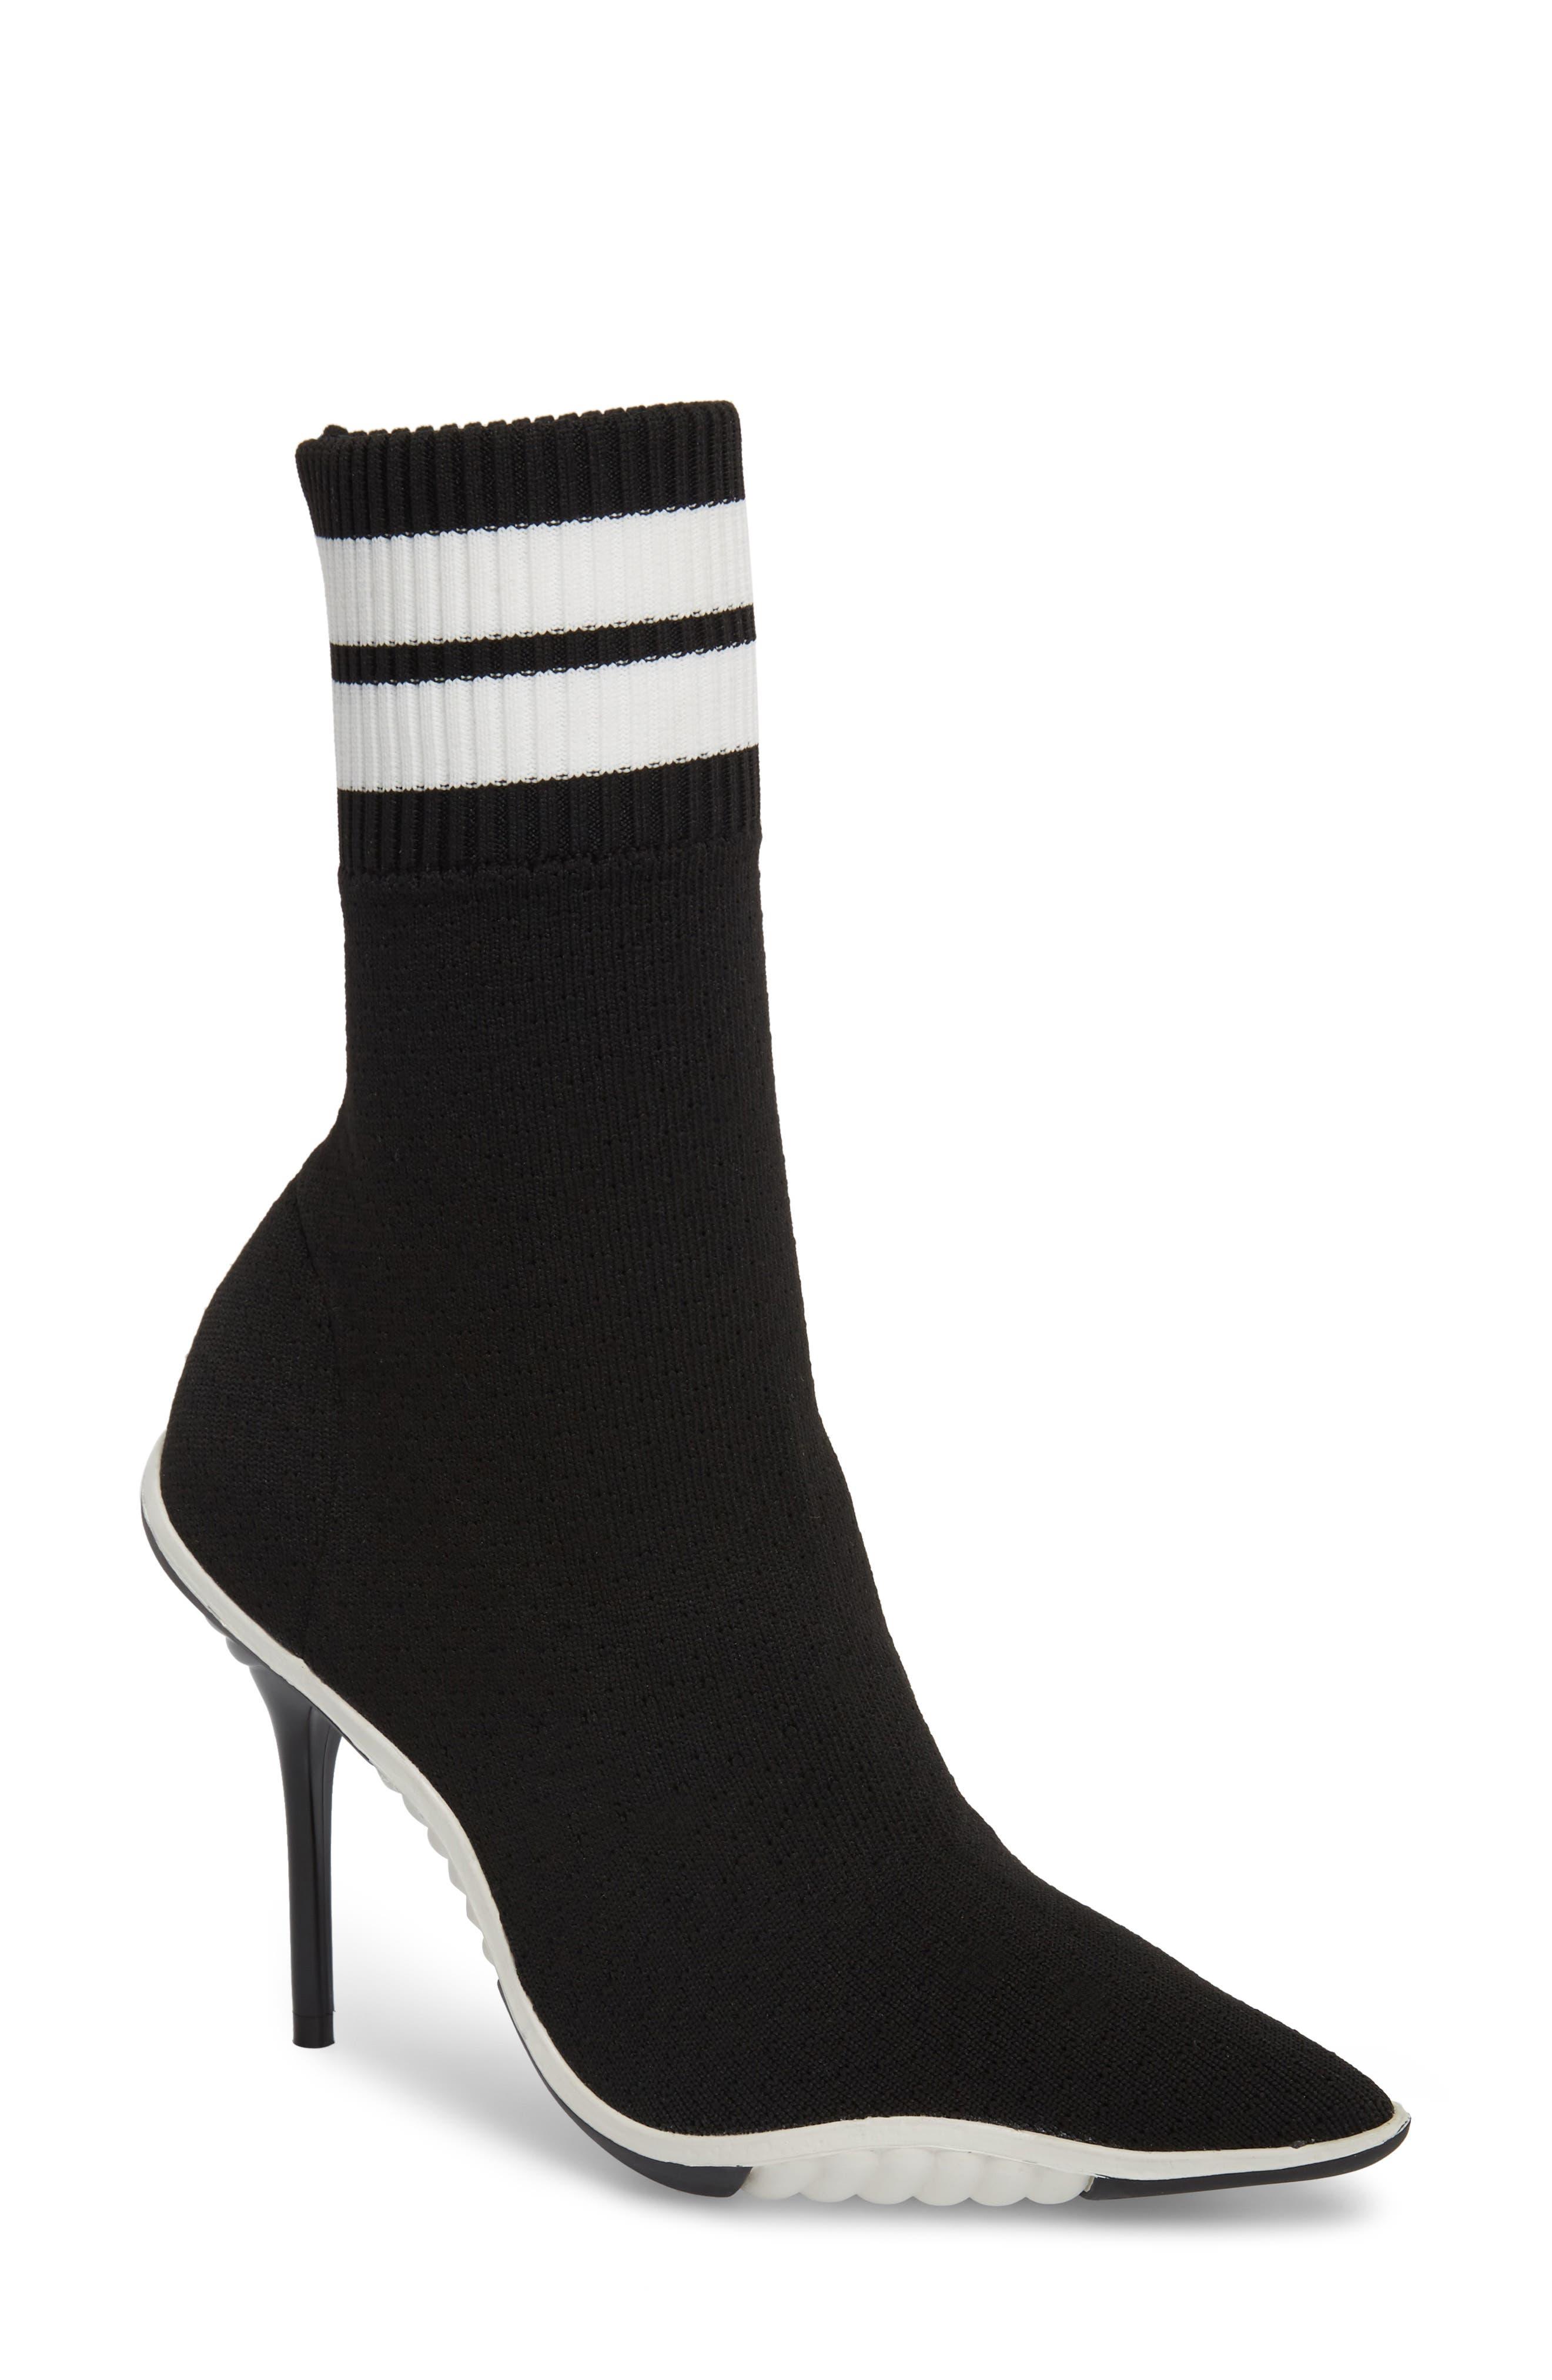 Goal Sock Sneaker Bootie,                             Main thumbnail 1, color,                             BLACK/ WHITE FABRIC